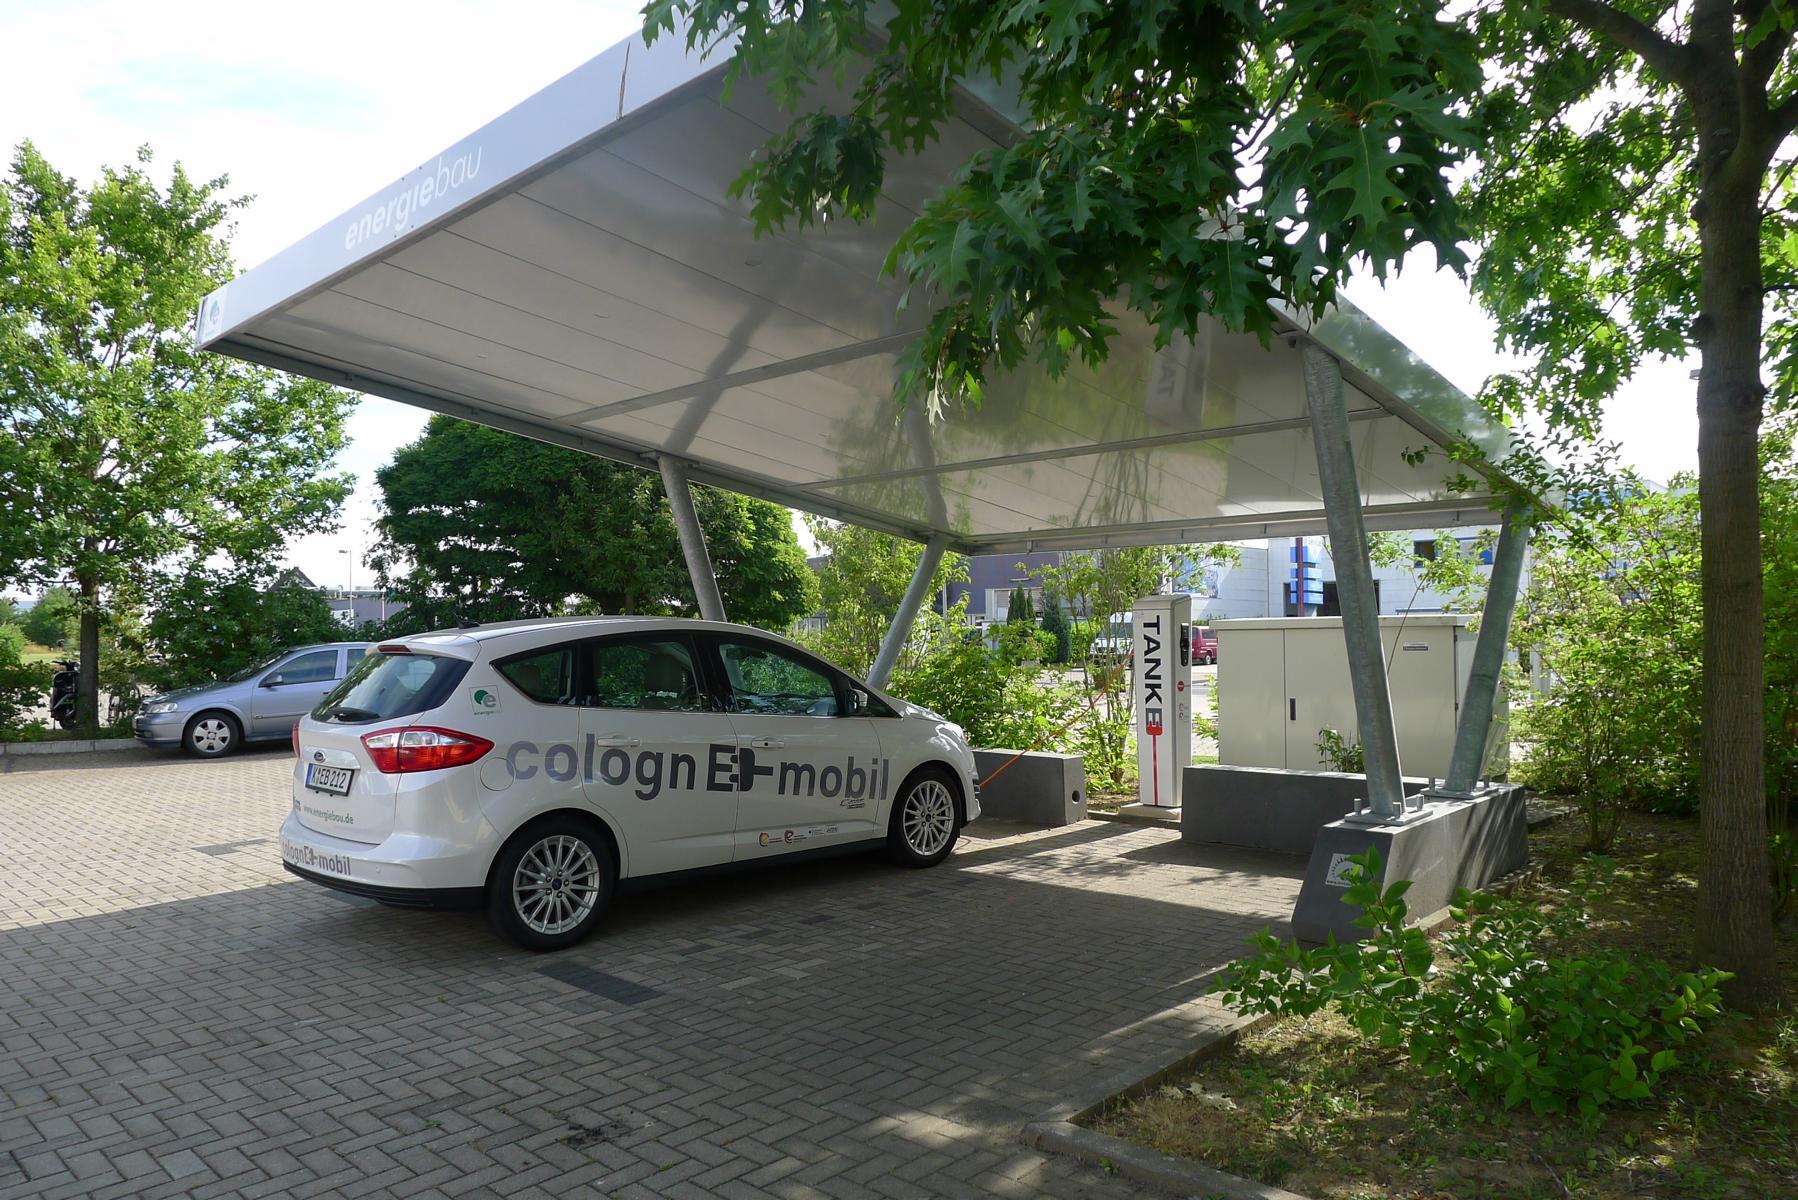 elektroauto ladestation in k ln von h nefeld stra e. Black Bedroom Furniture Sets. Home Design Ideas